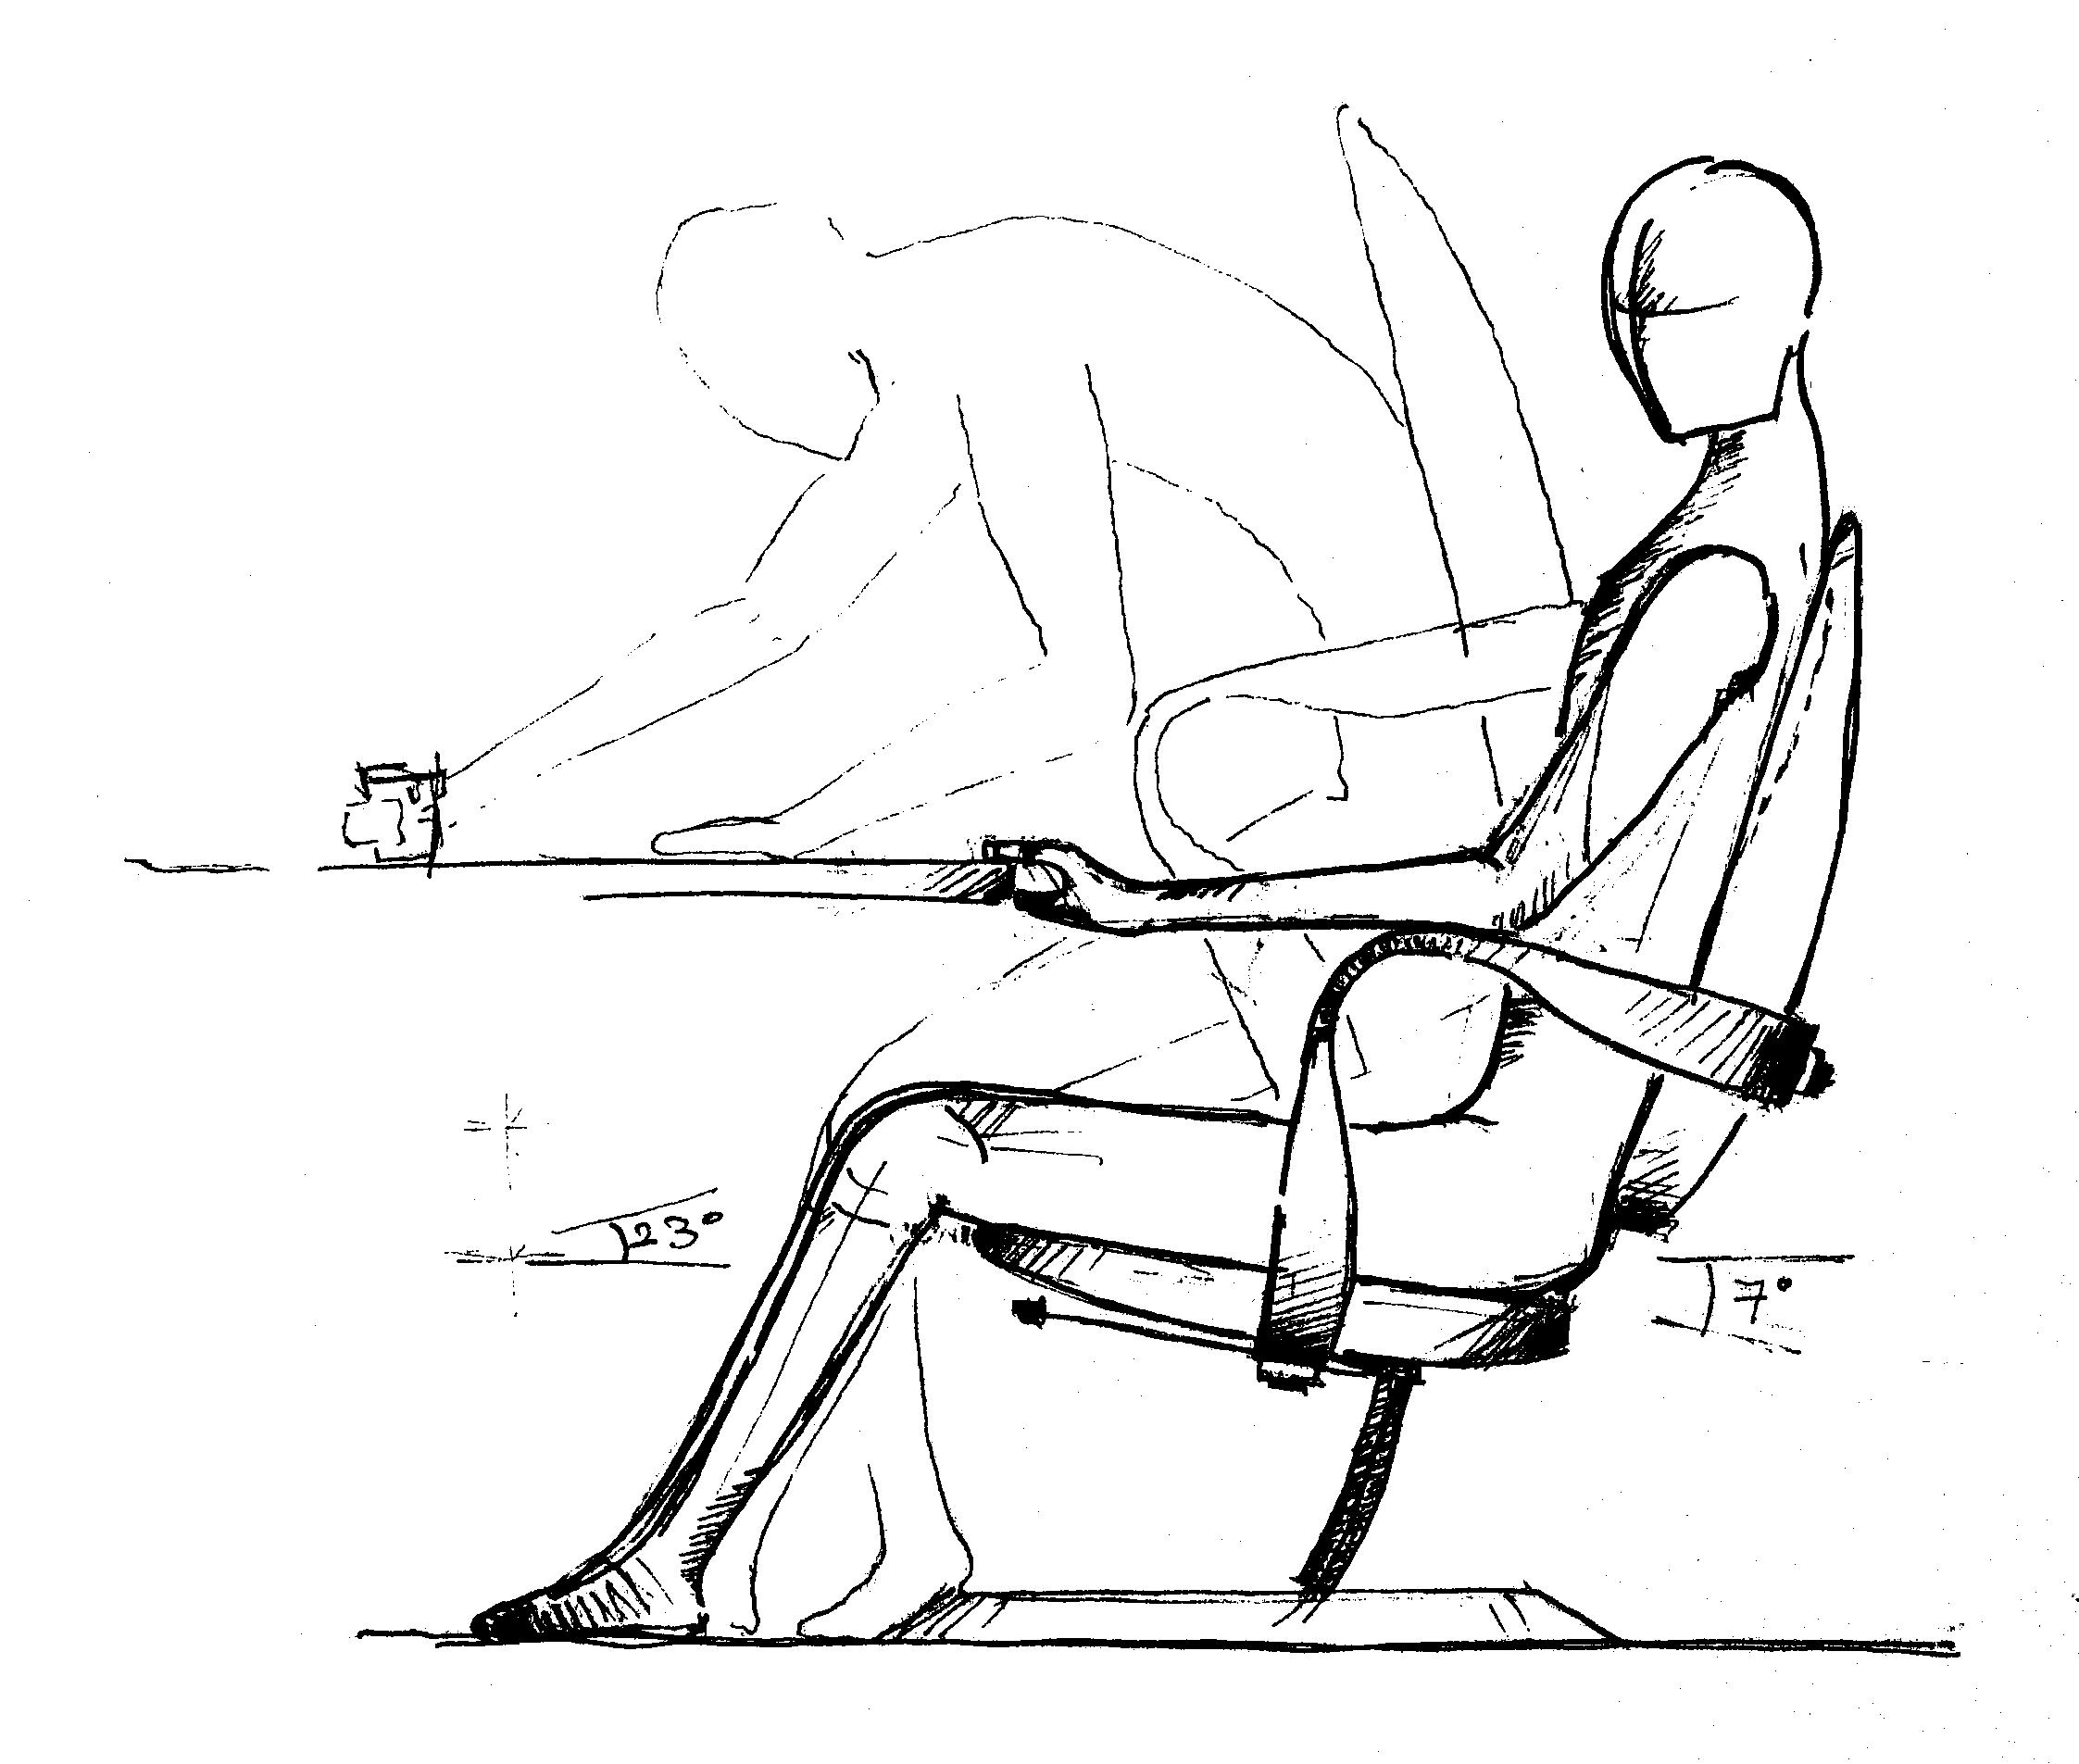 Office furniture design sketches - Amazing Office Furniture Sketch Vector Set Of Sketch Furniture